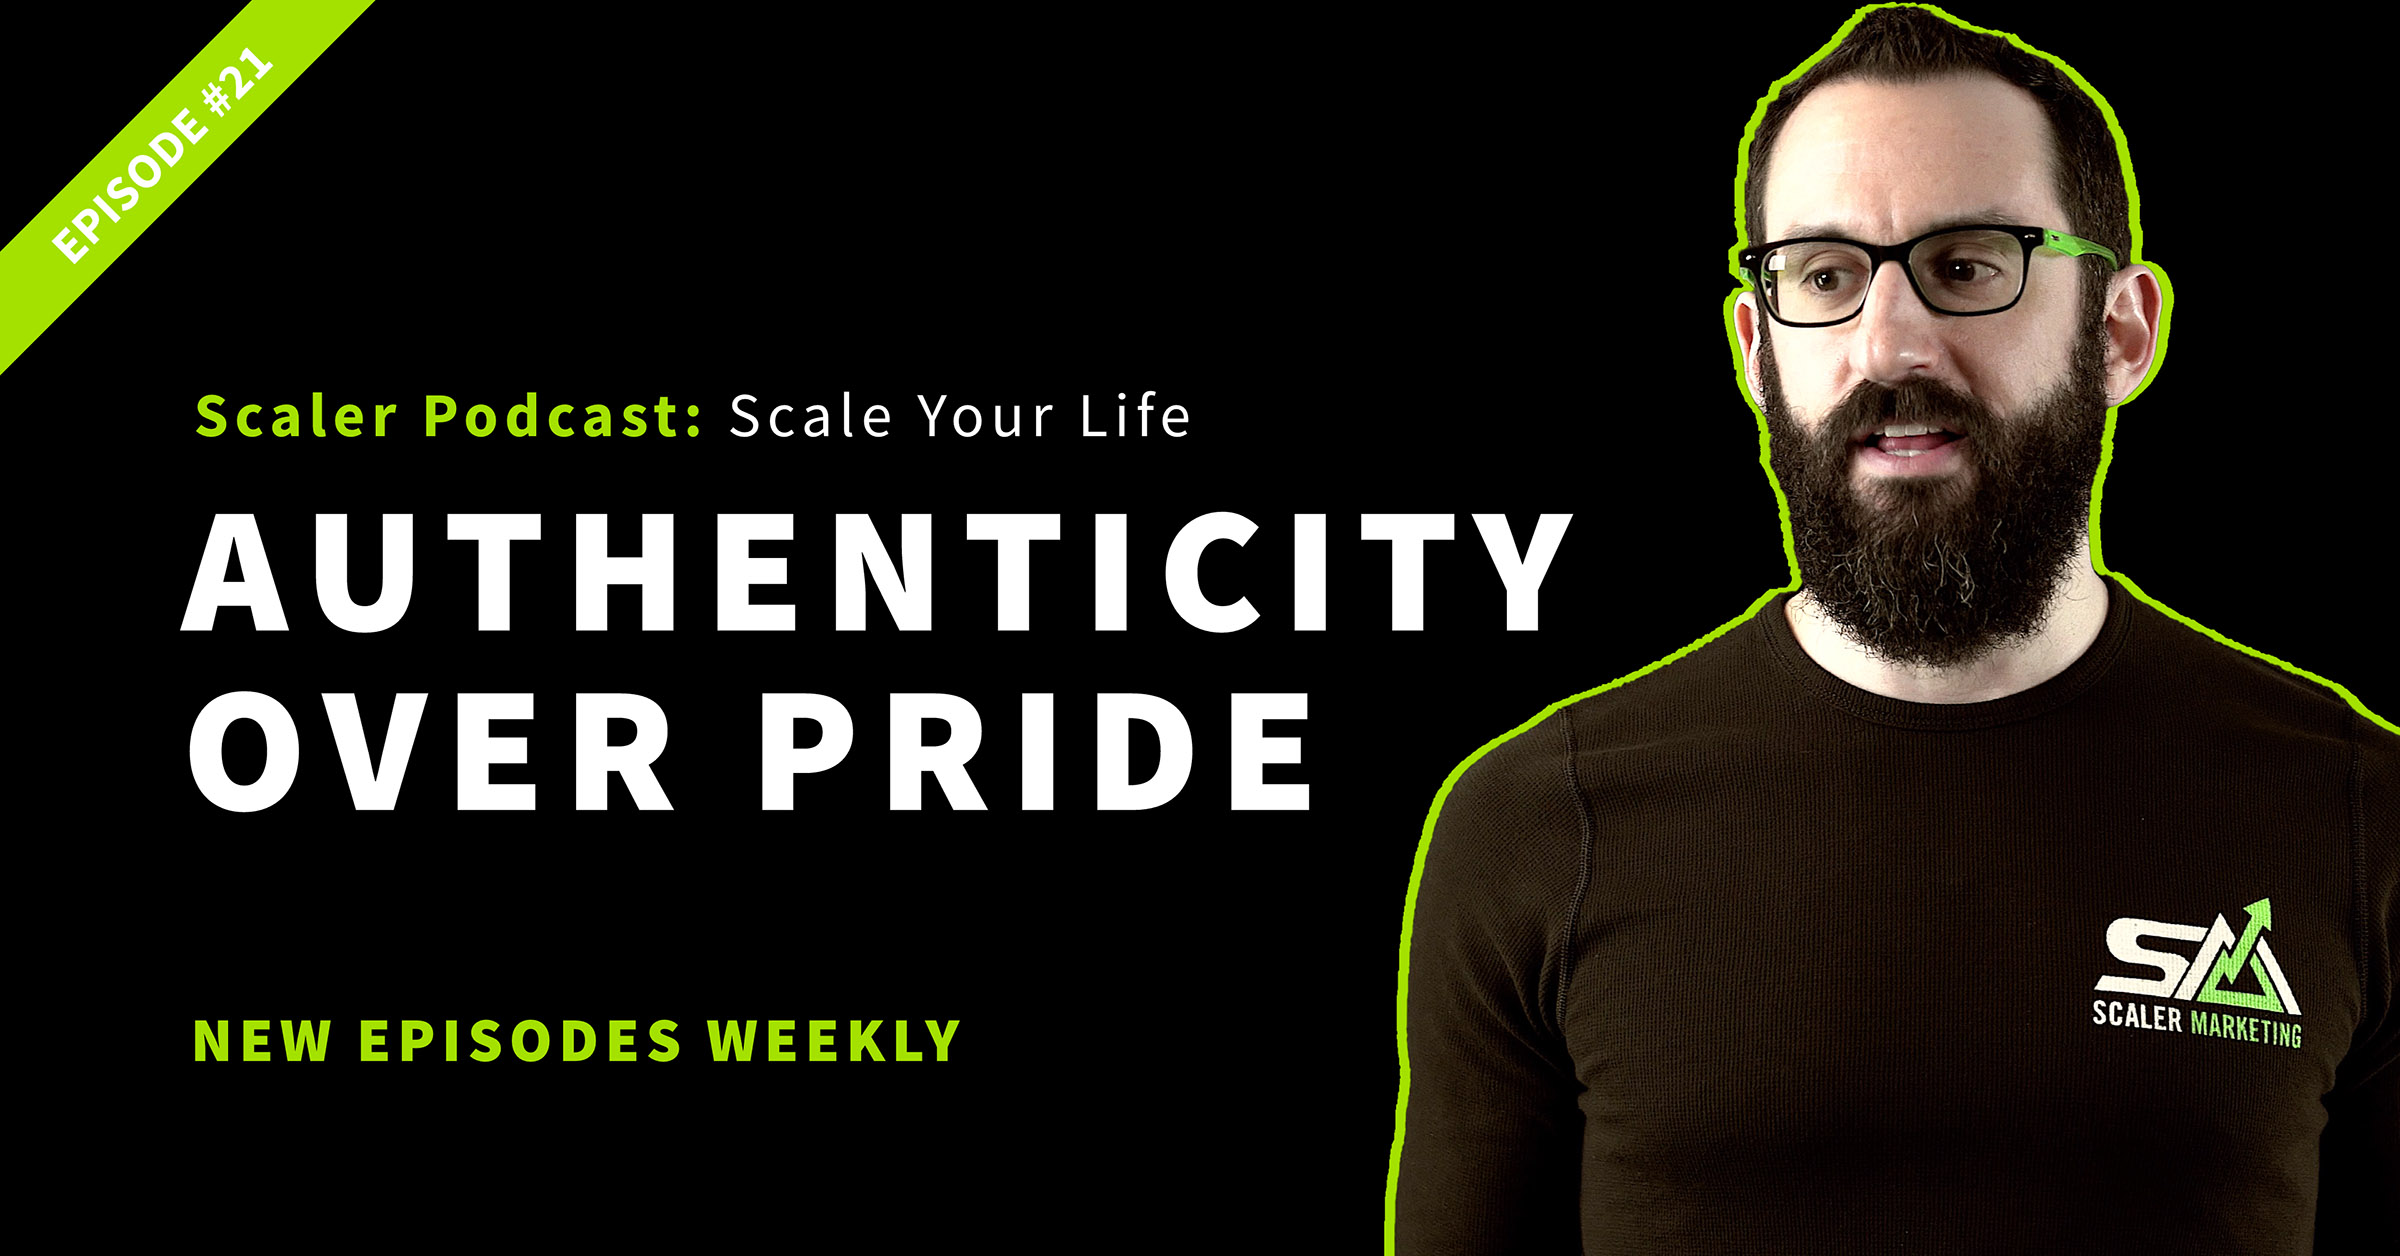 Episode 21 - Authenticity Over Pride